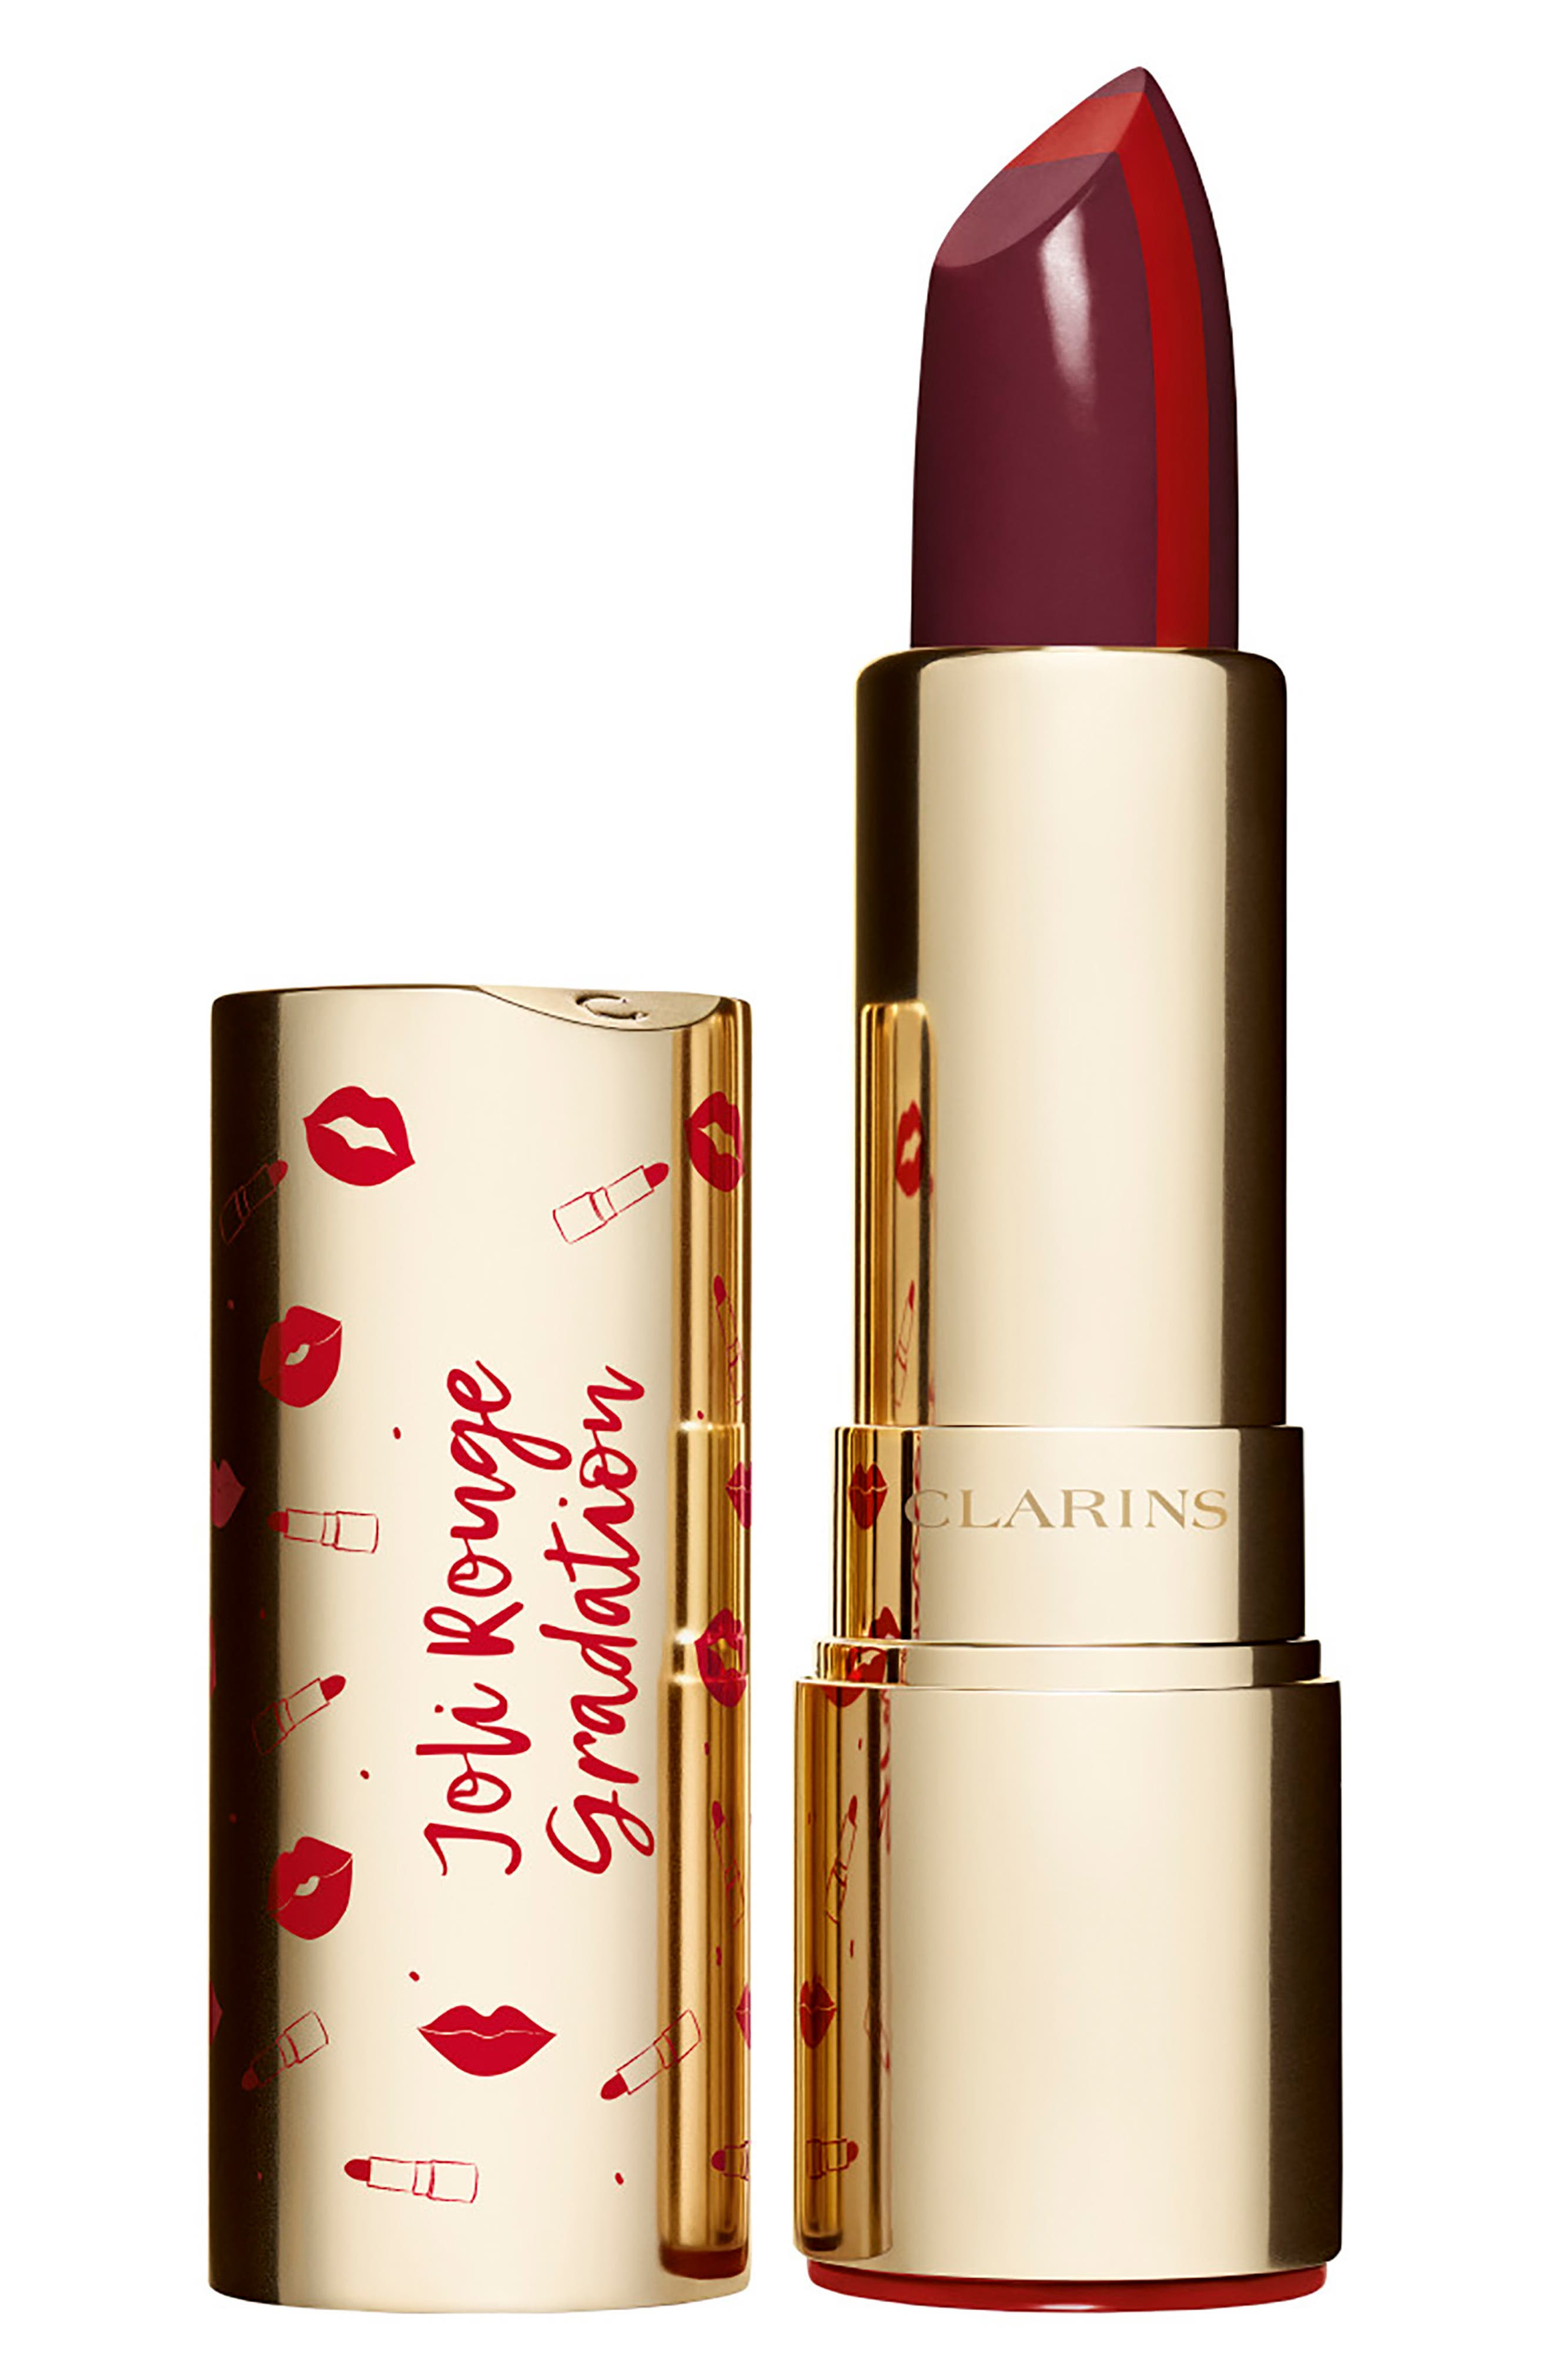 CLARINS, Joli Rouge Gradation Lipstick, Main thumbnail 1, color, 754 DEEP RED/738 PLUM